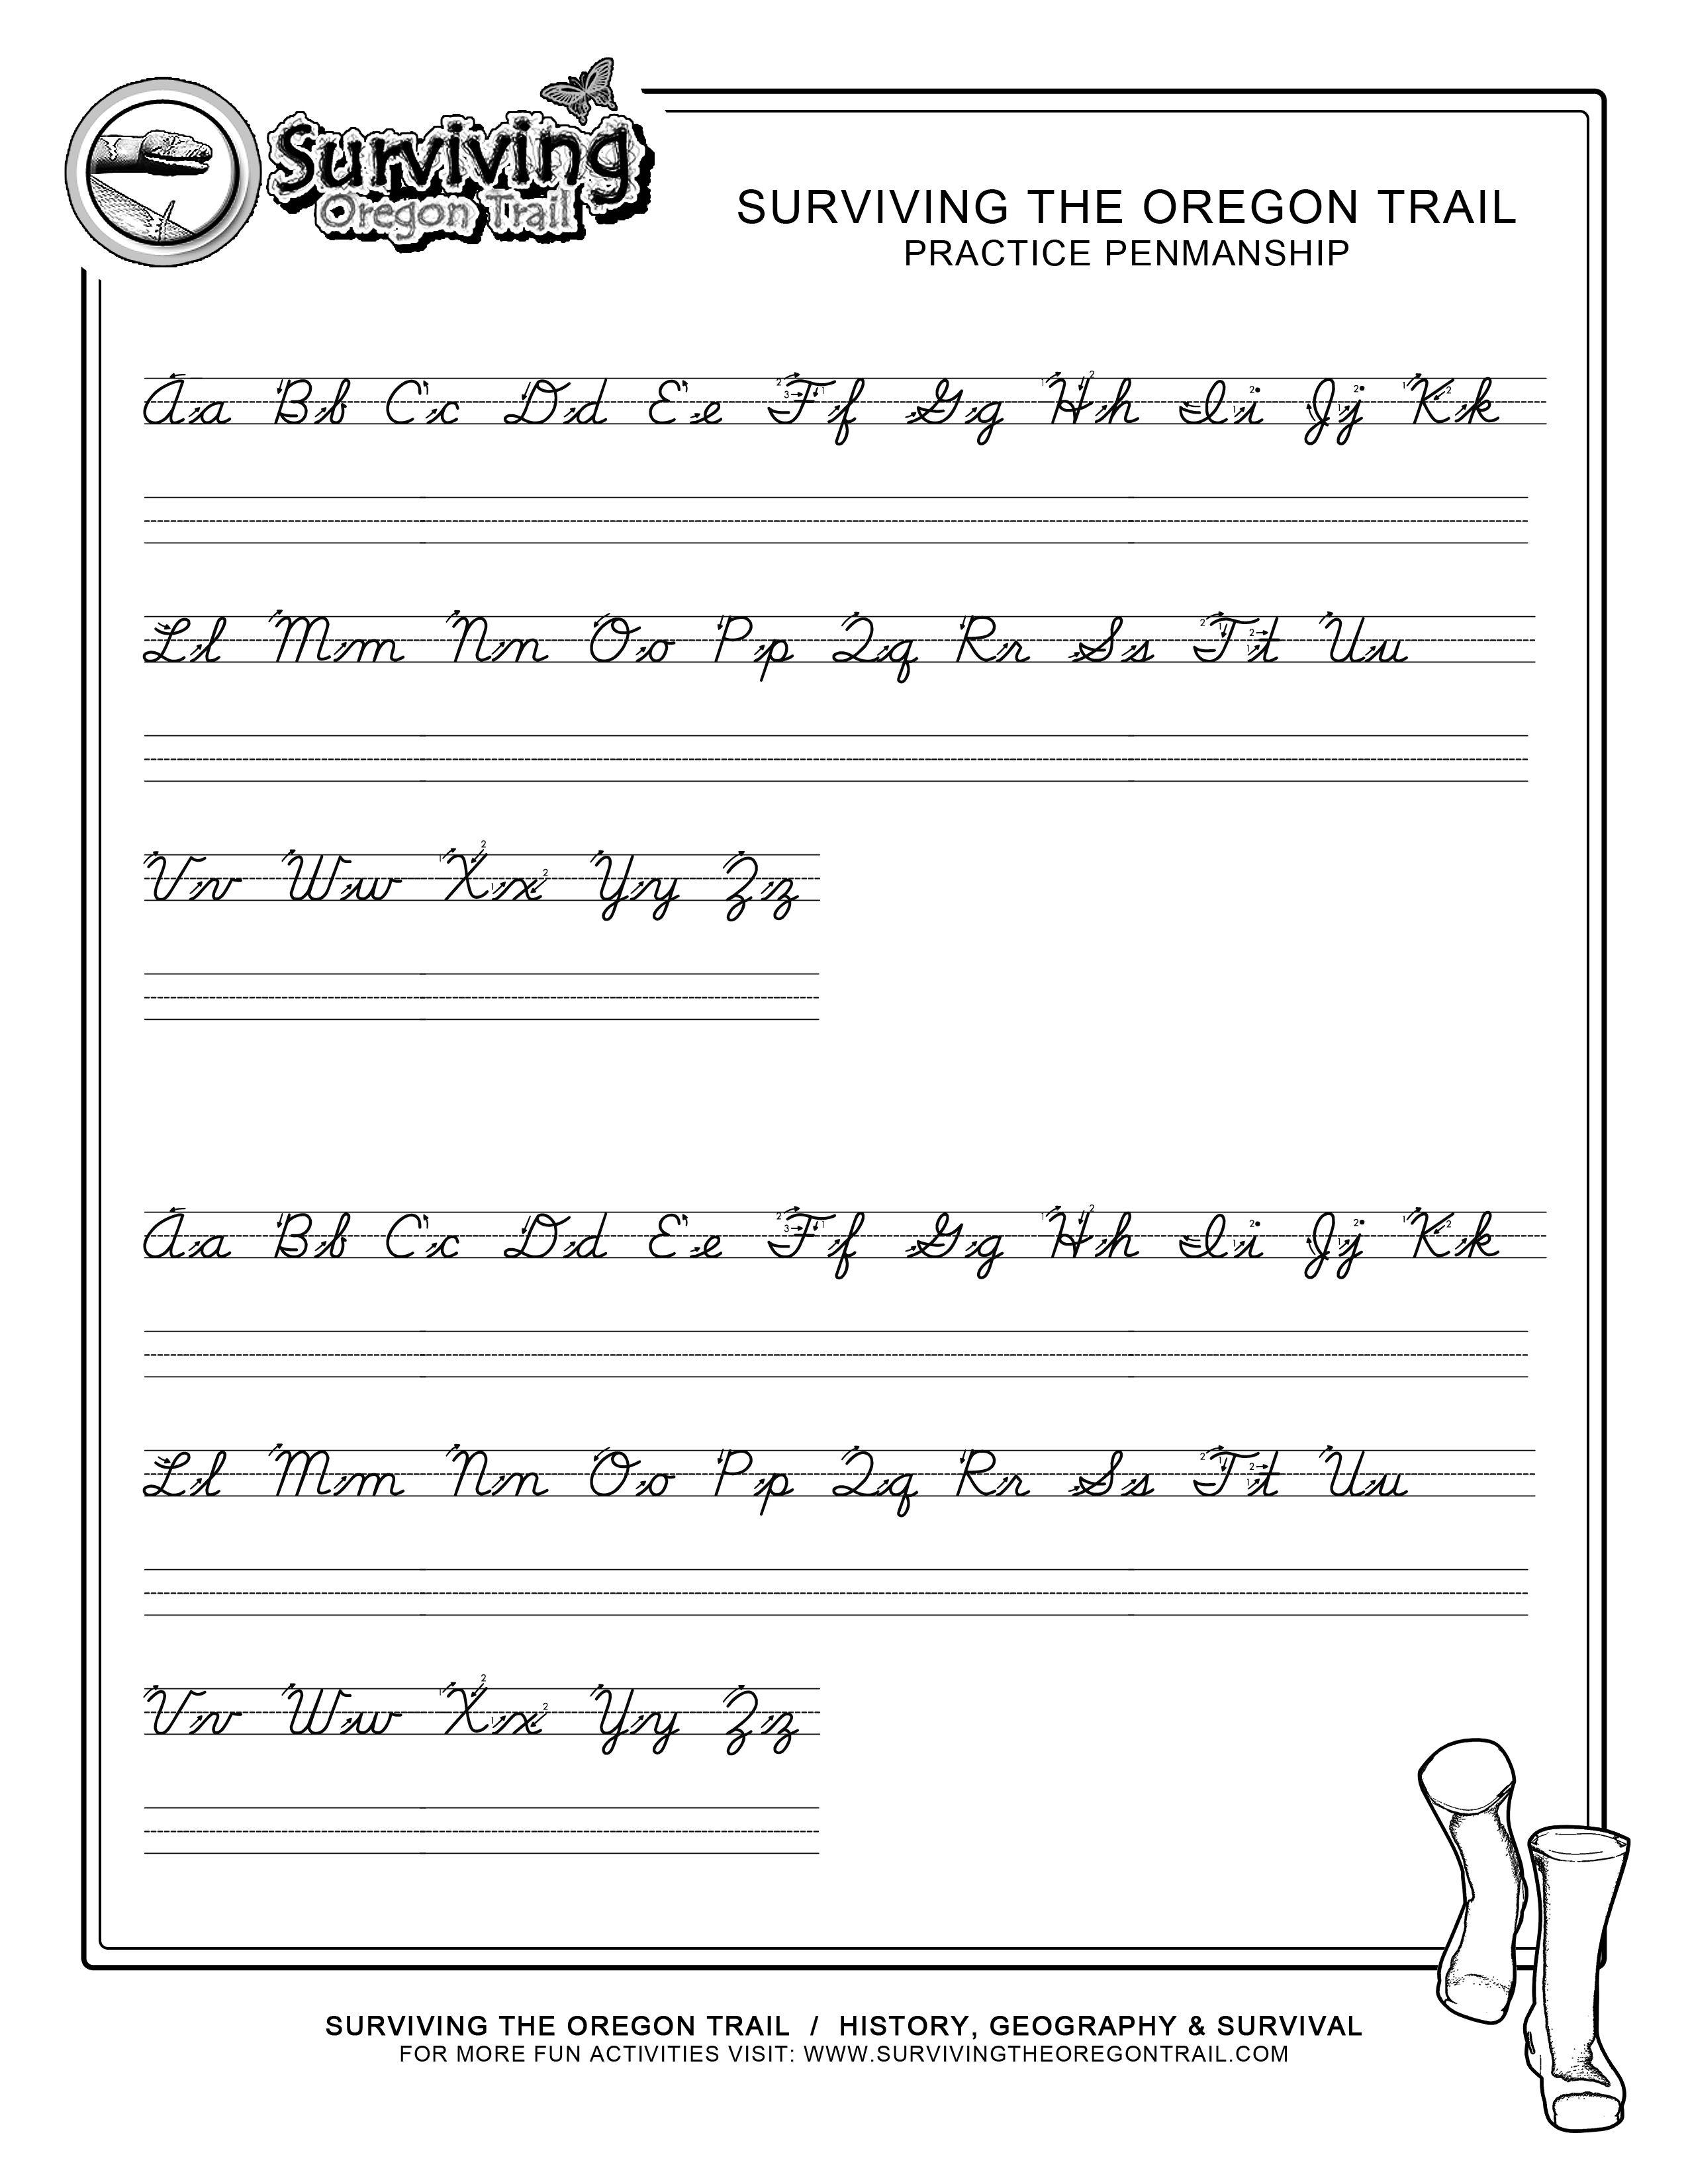 Practice Penmanship – Free Abc's Printable Cursive Writing Worksheet - Free Printable Script Writing Worksheets